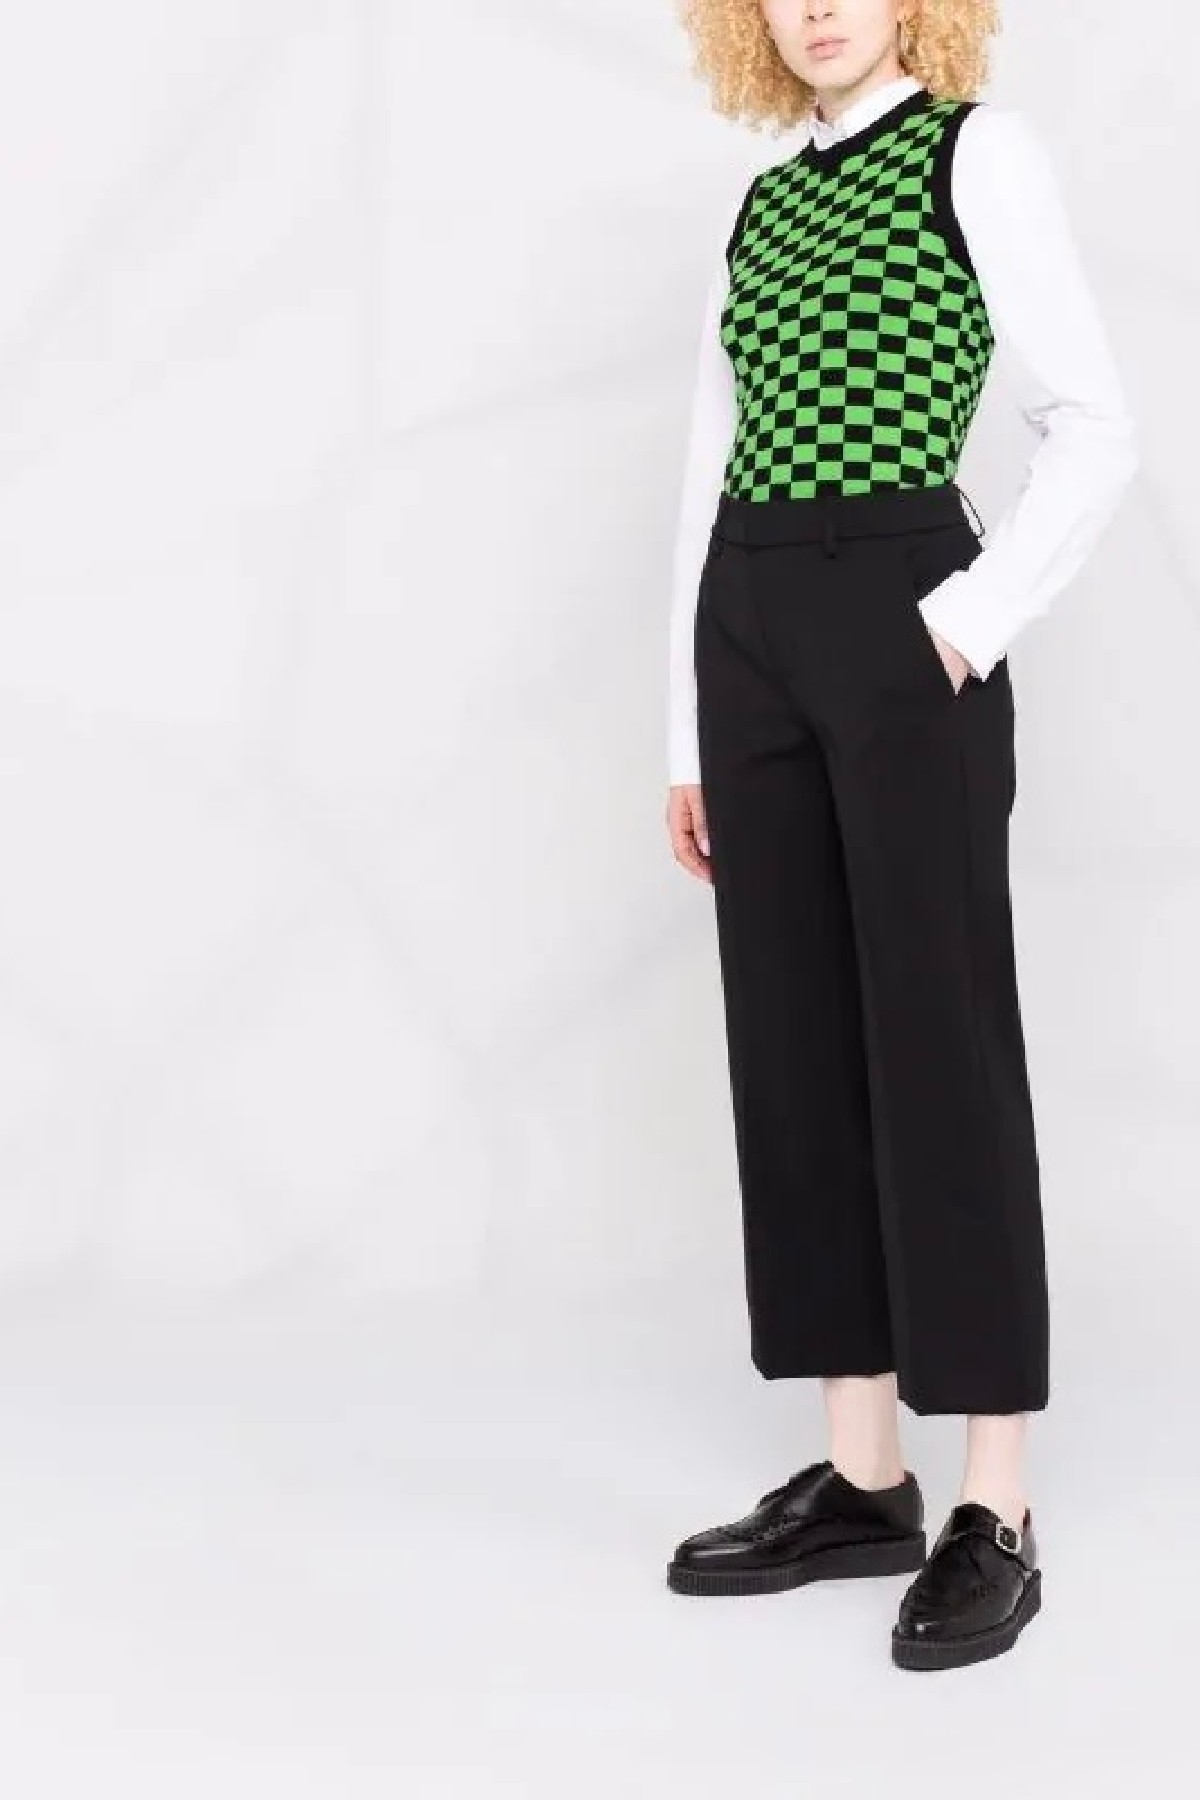 pantalone cropped loose meli nero in tela di lana bistretch DONDUP | 9 | DP575GS0050D999